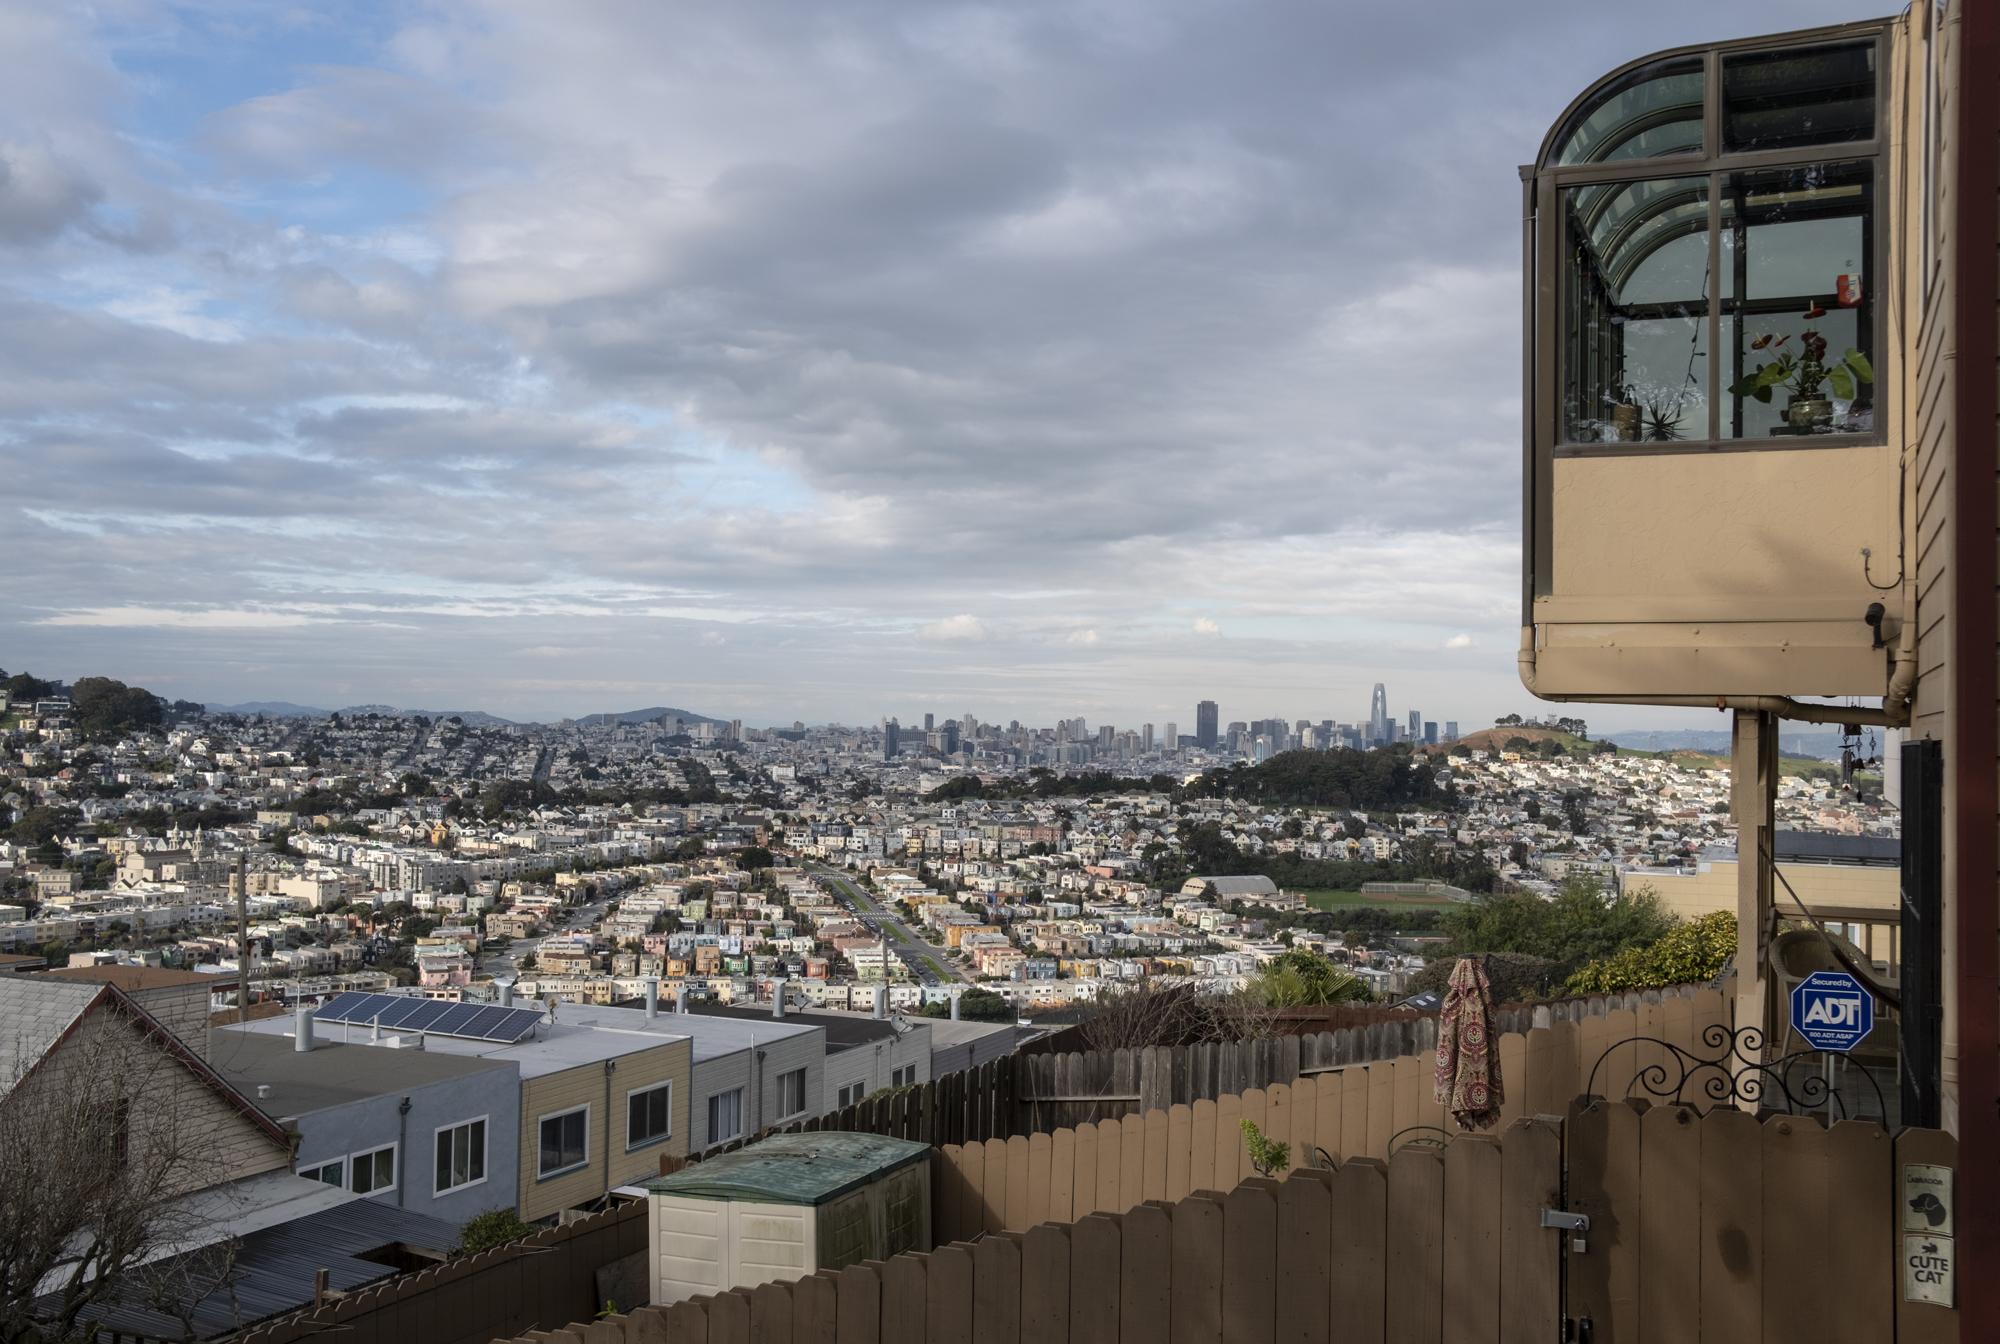 SF and The Salesforce Tower_#11_©Henrik Kam 2019.jpg